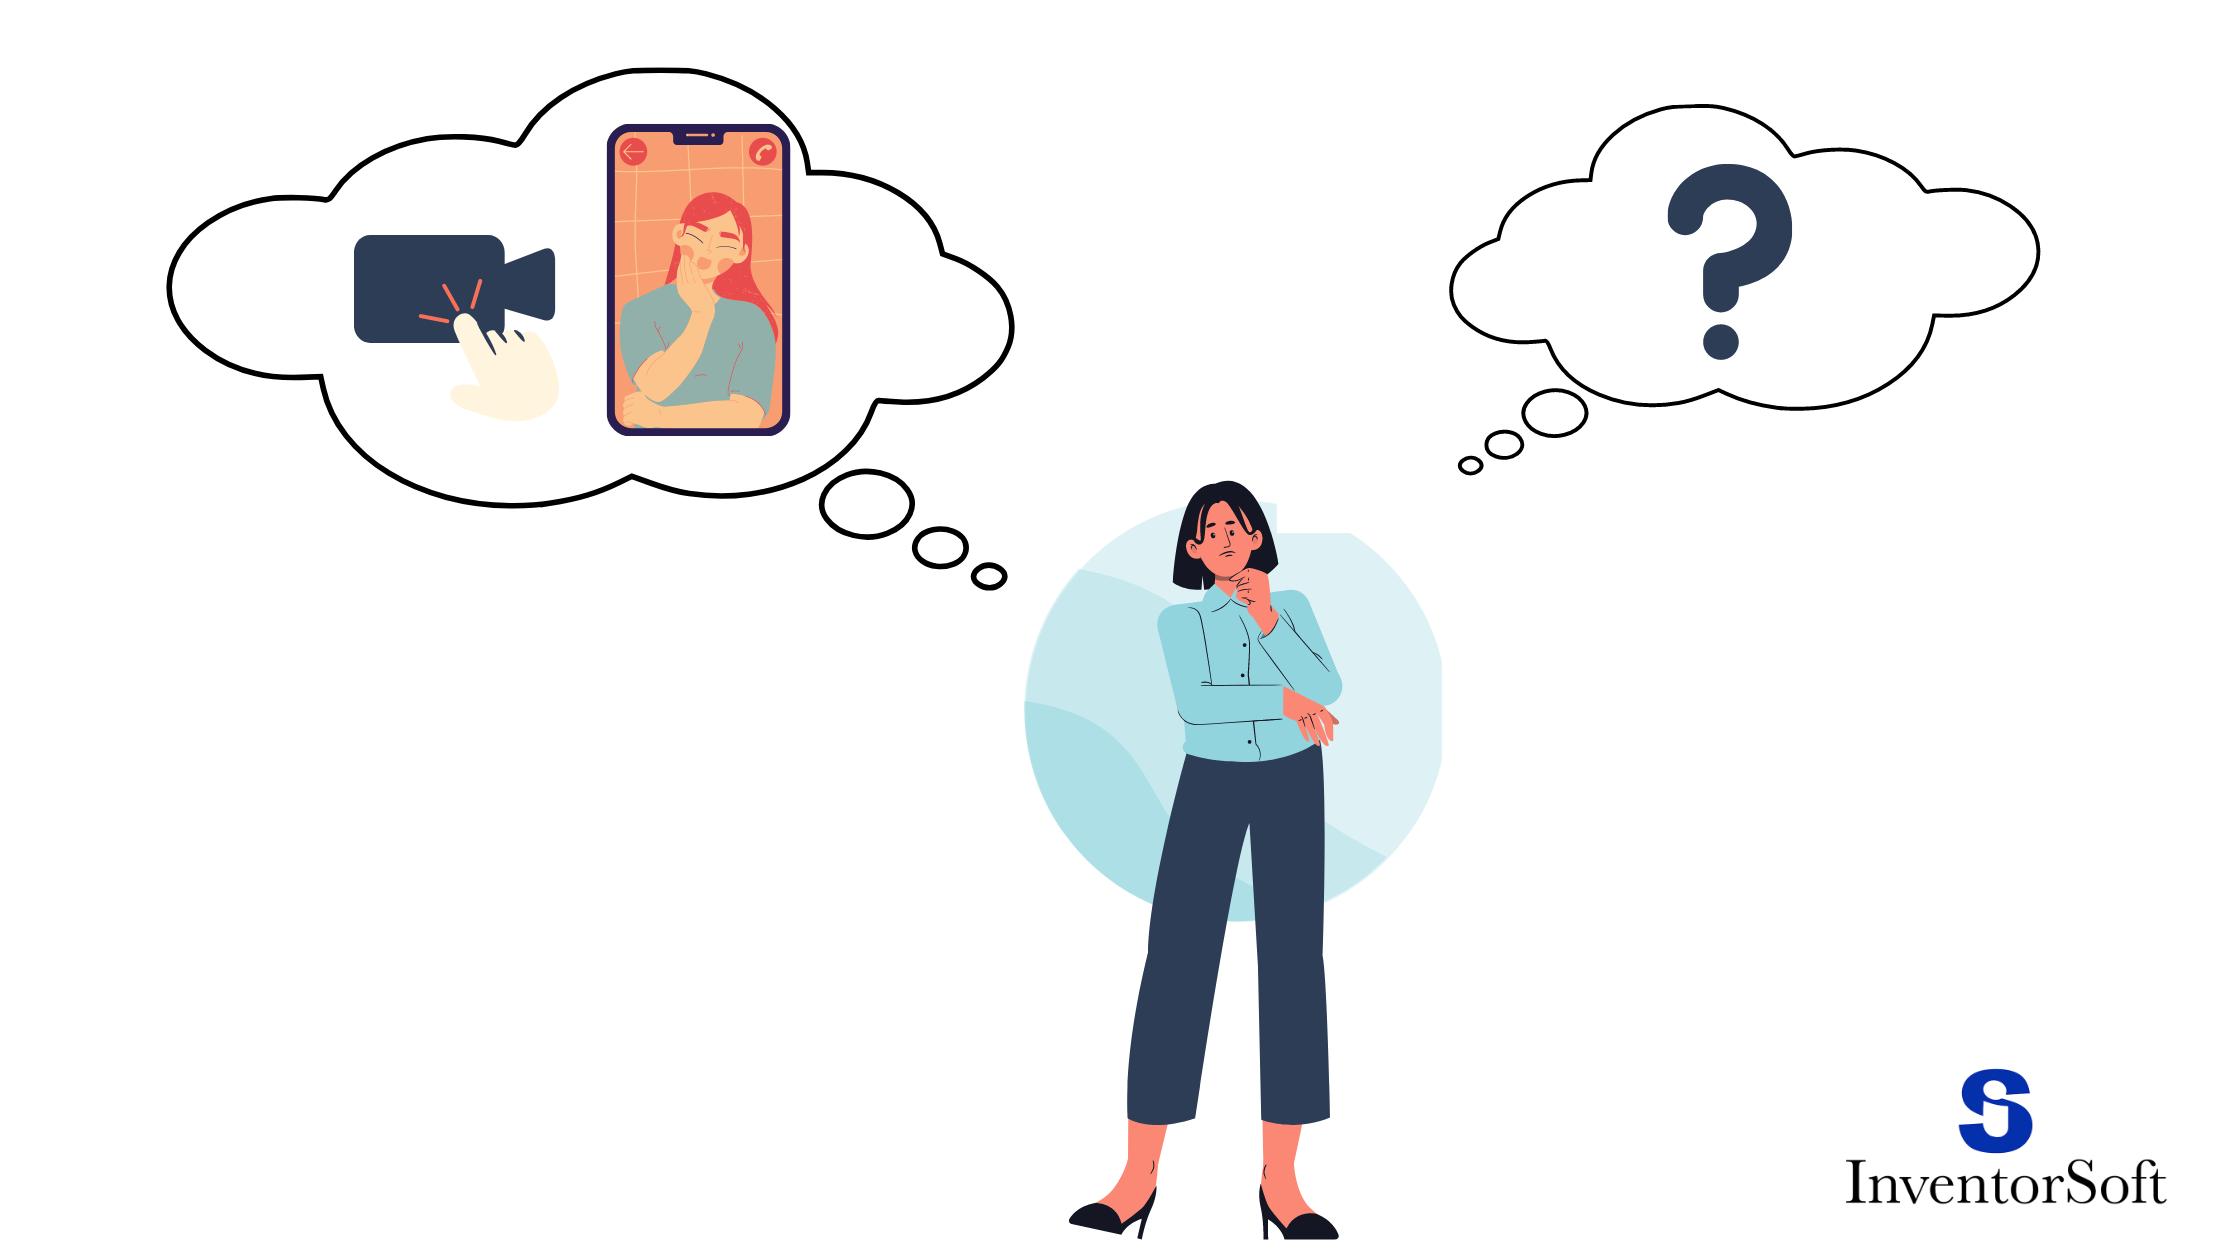 coronavirus impact on business: importance of video calls